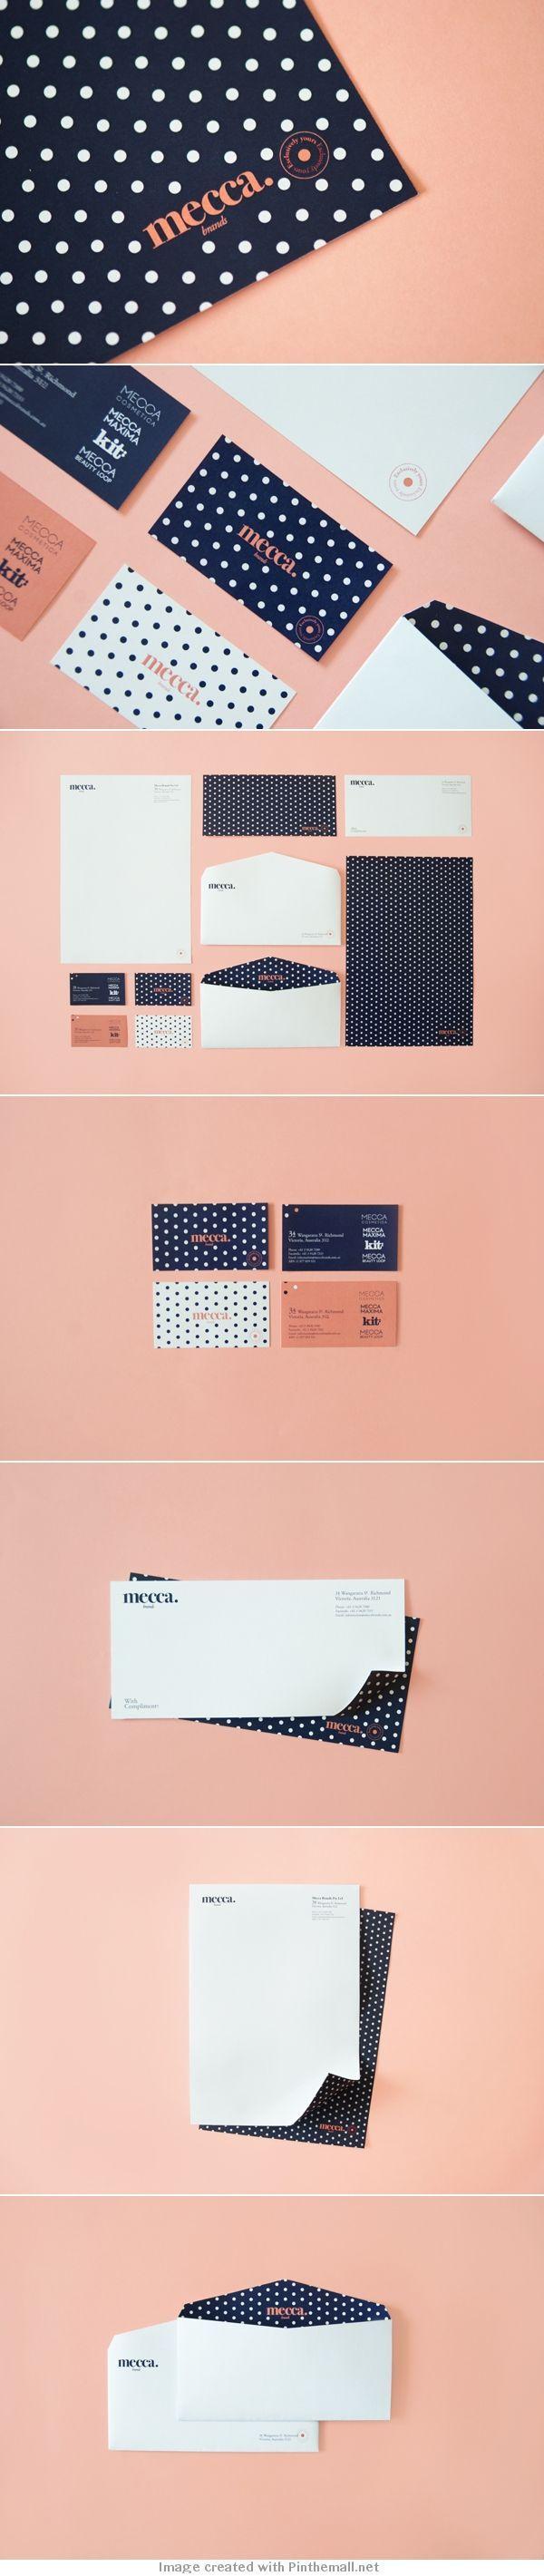 graphic design inspiration corporate design branding pinterest grafik design corporate. Black Bedroom Furniture Sets. Home Design Ideas